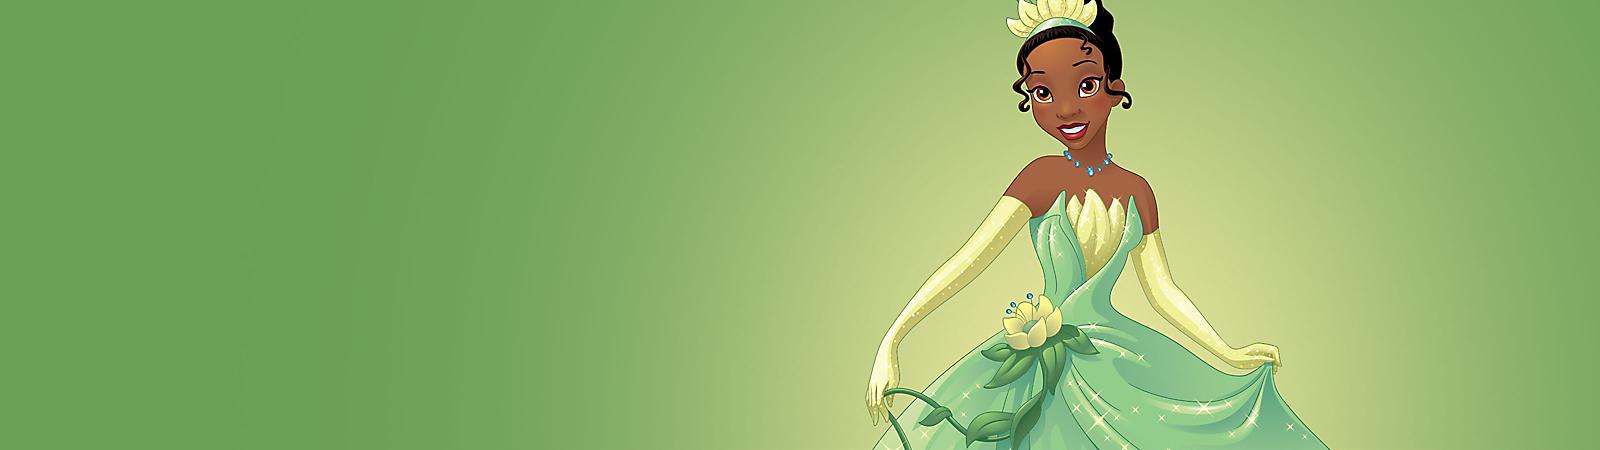 Tiana The Princess And The Frog Shopdisney